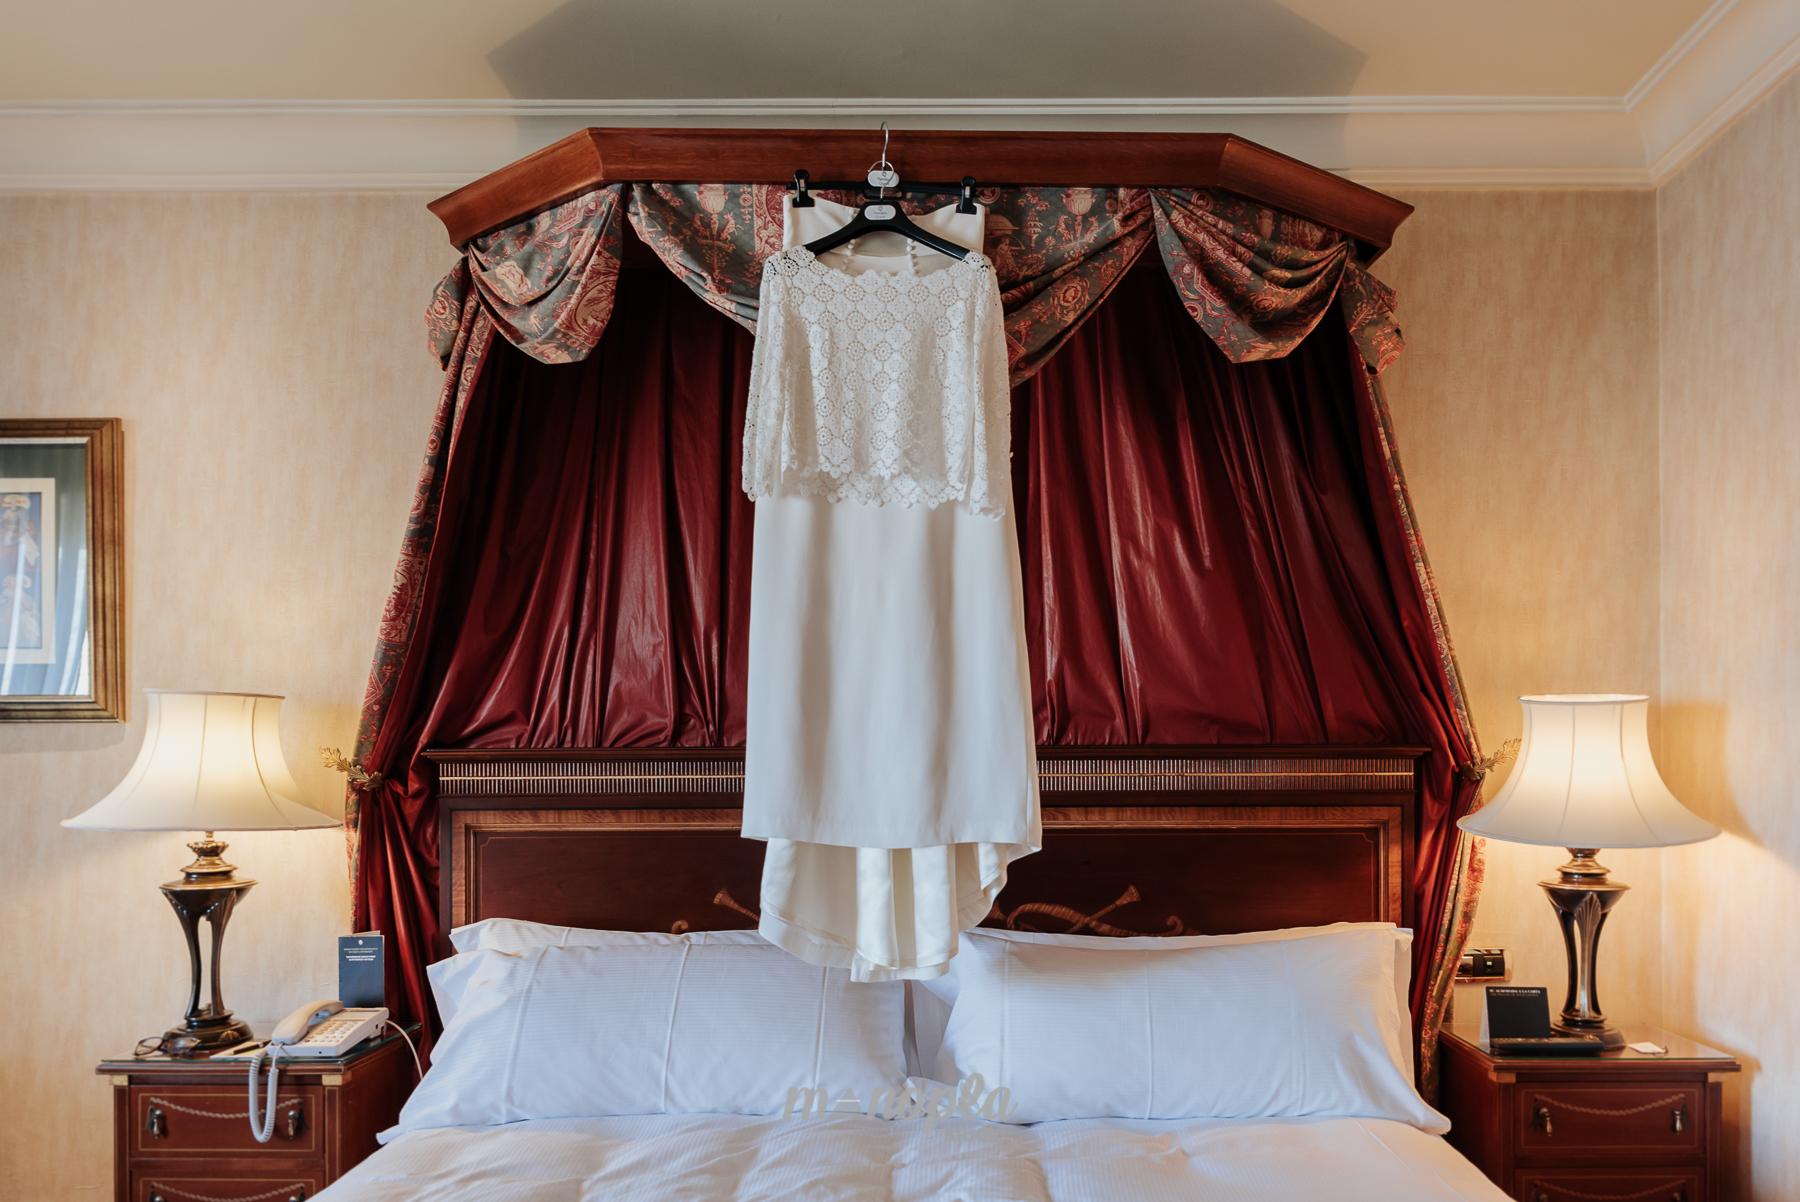 boda en segovia, fotografo bodas segovia, paradero quirós, hotel wellington,